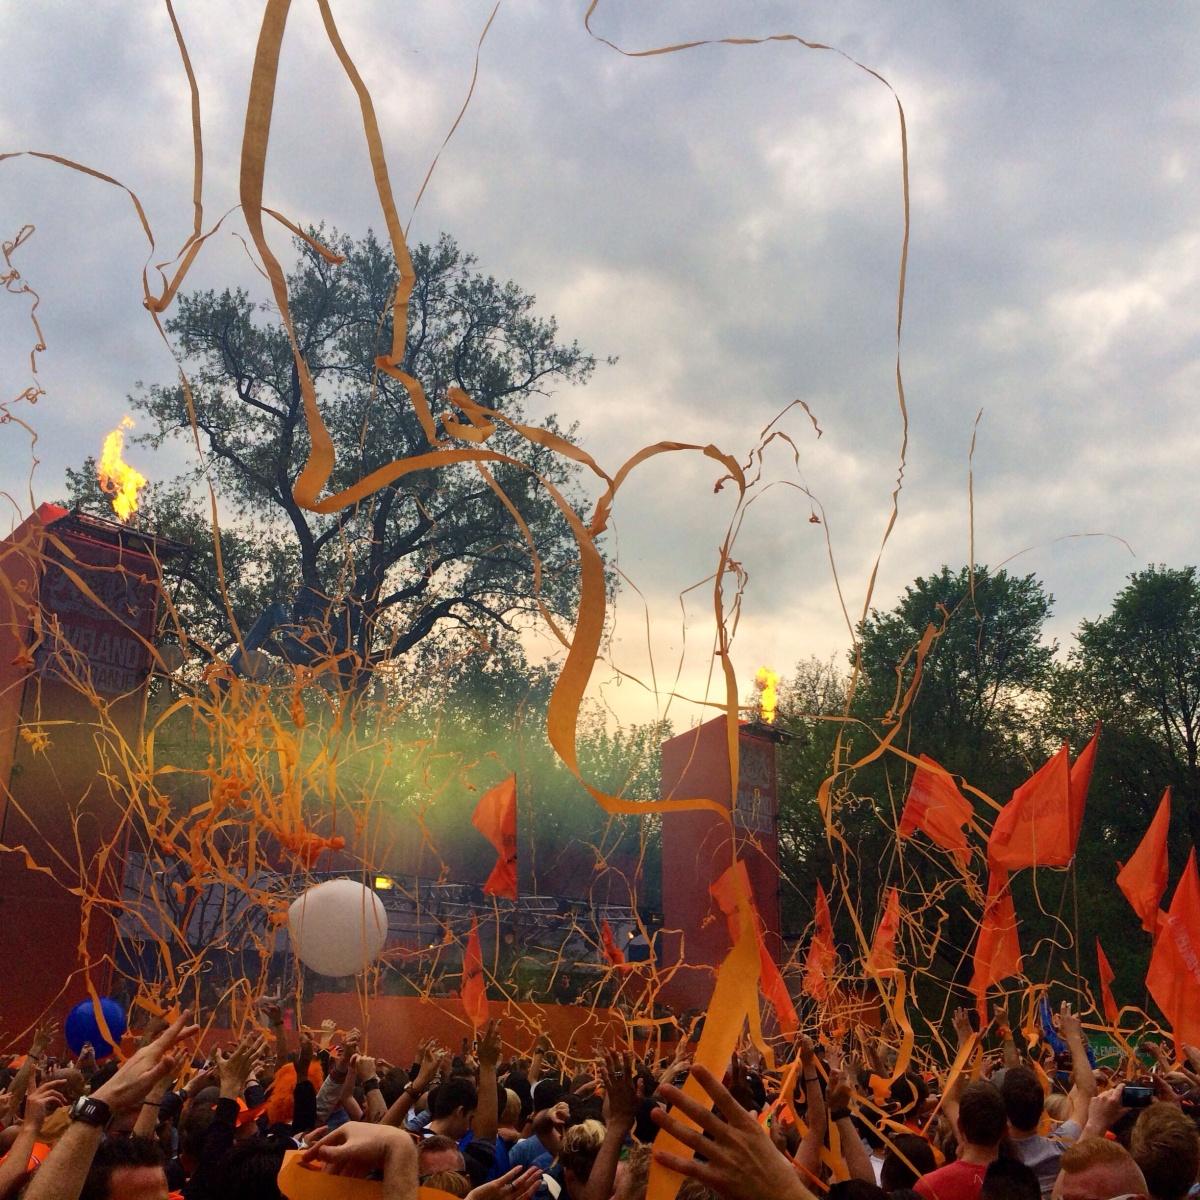 Orange for Kings Day inAmsterdam